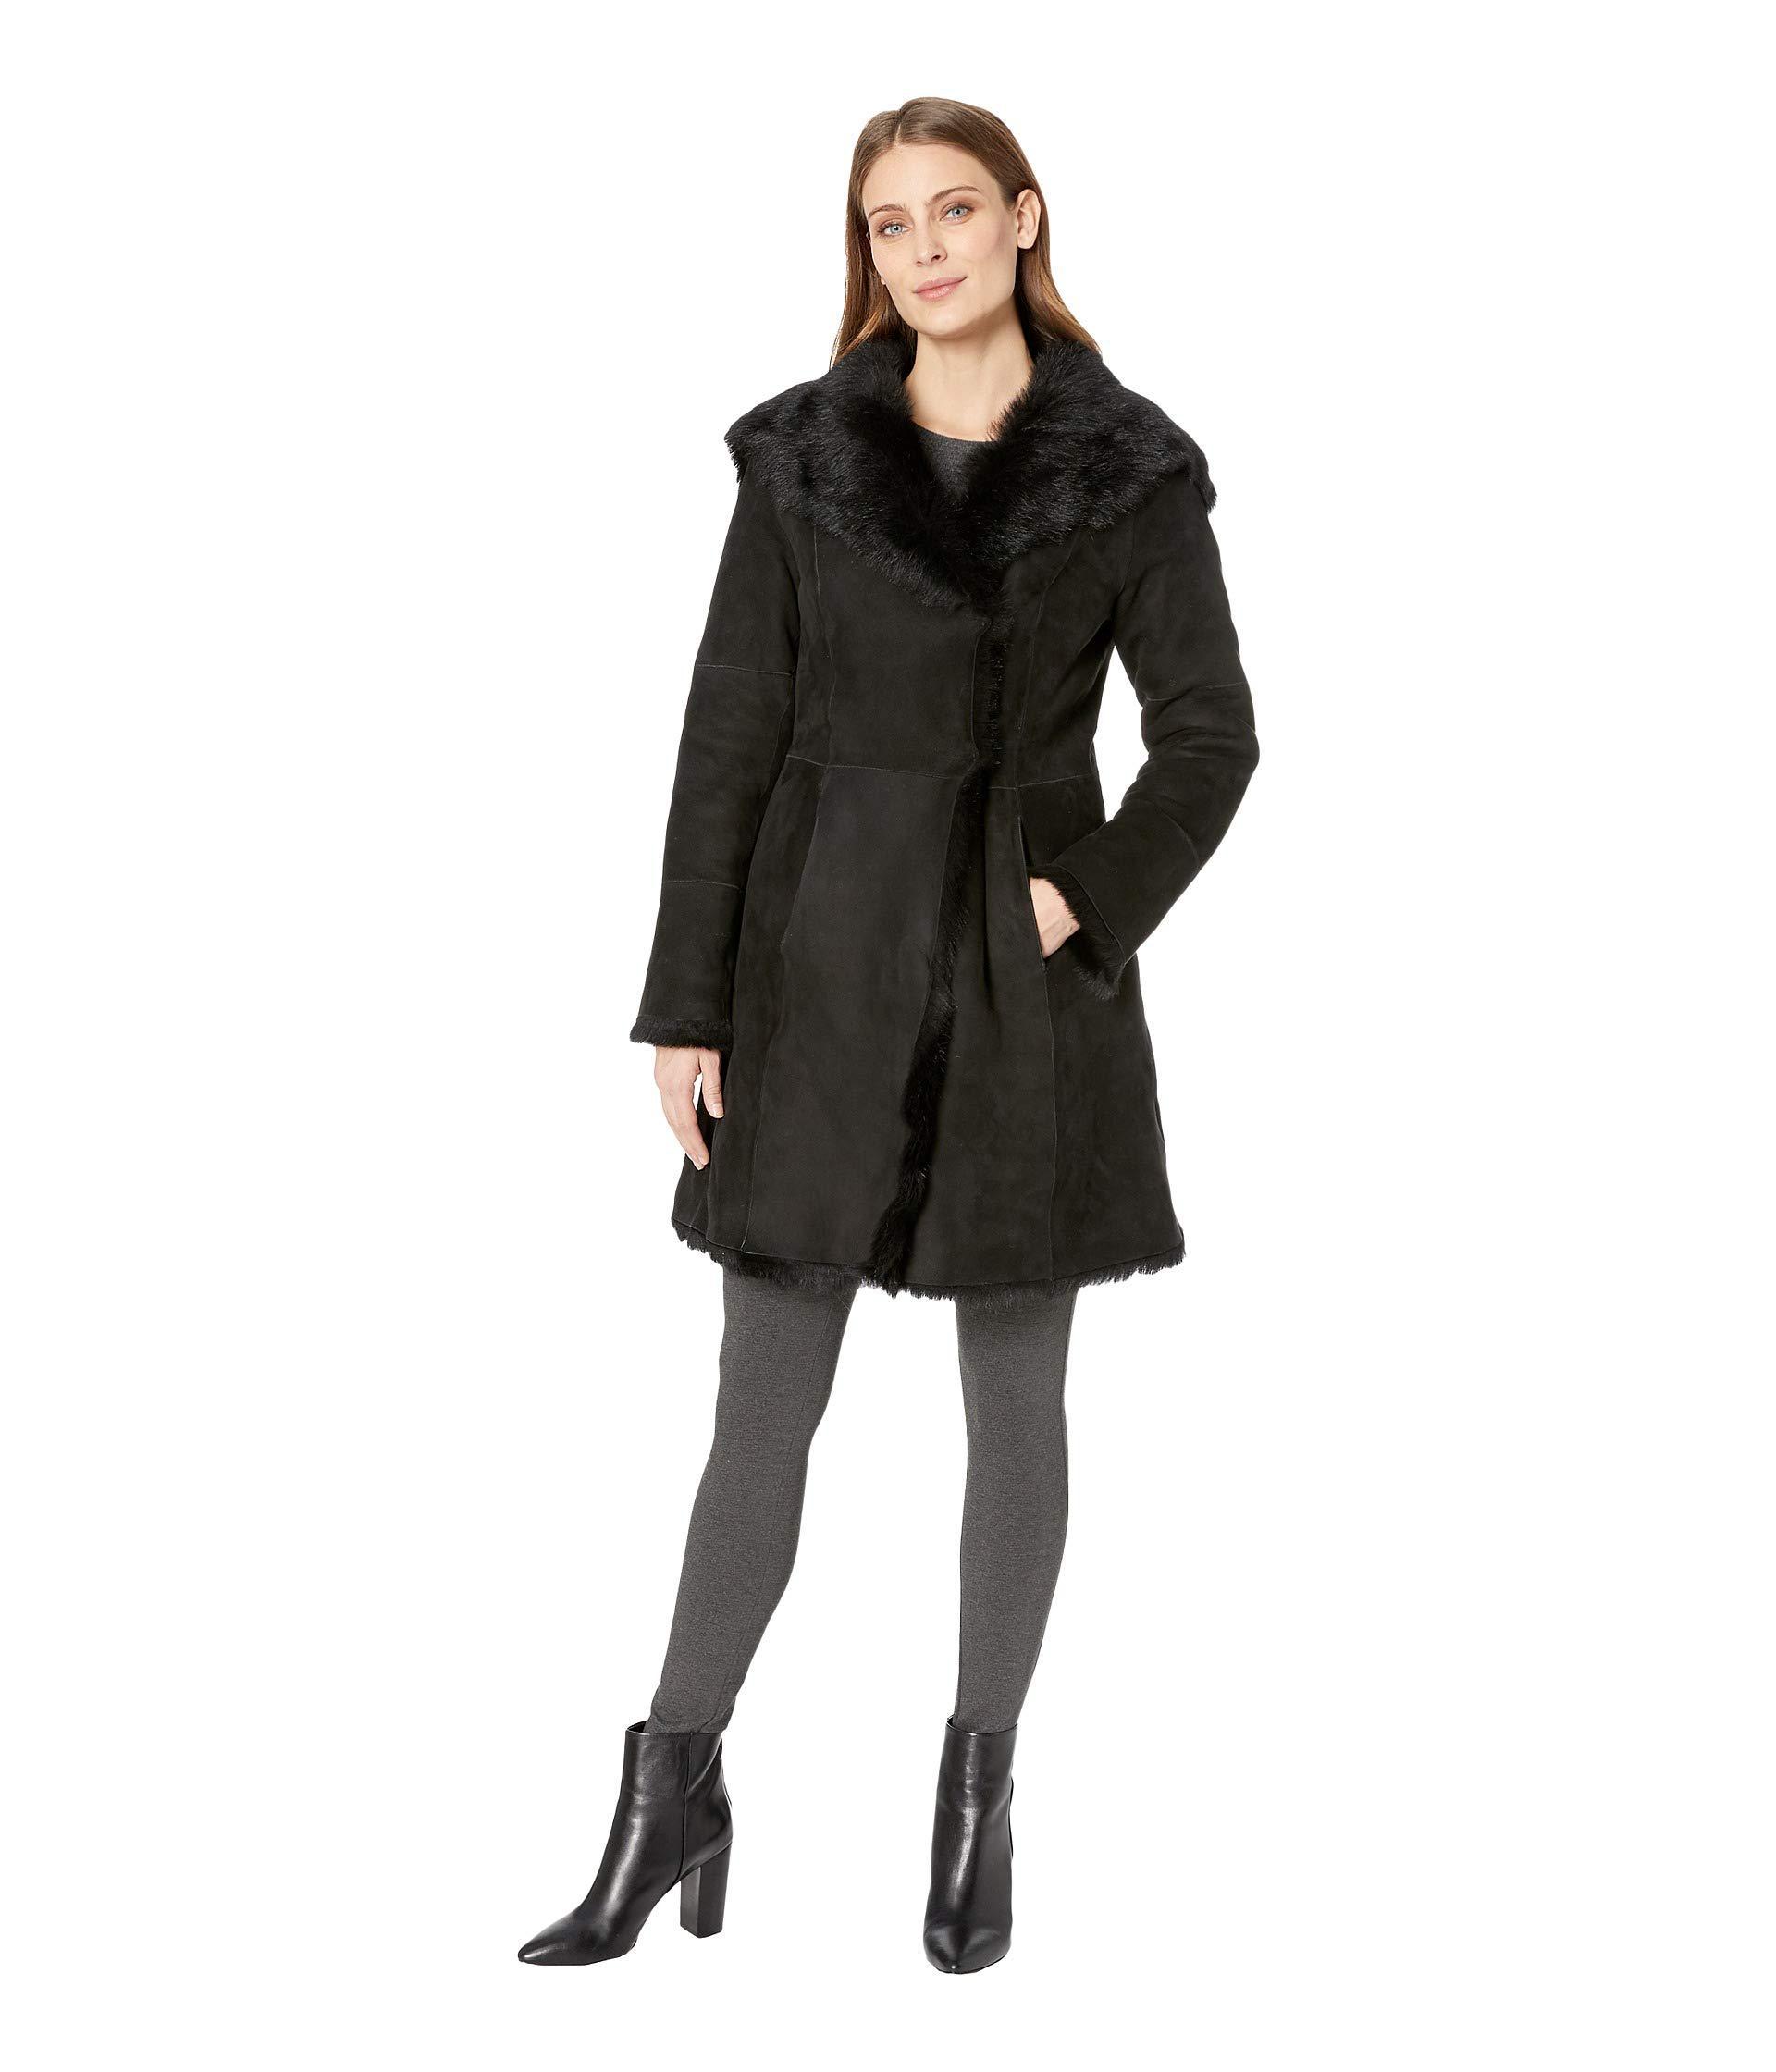 8e51d9411b Lyst - UGG Vanesa Toscana Shearling Coat (chestnut) Women s Coat in ...